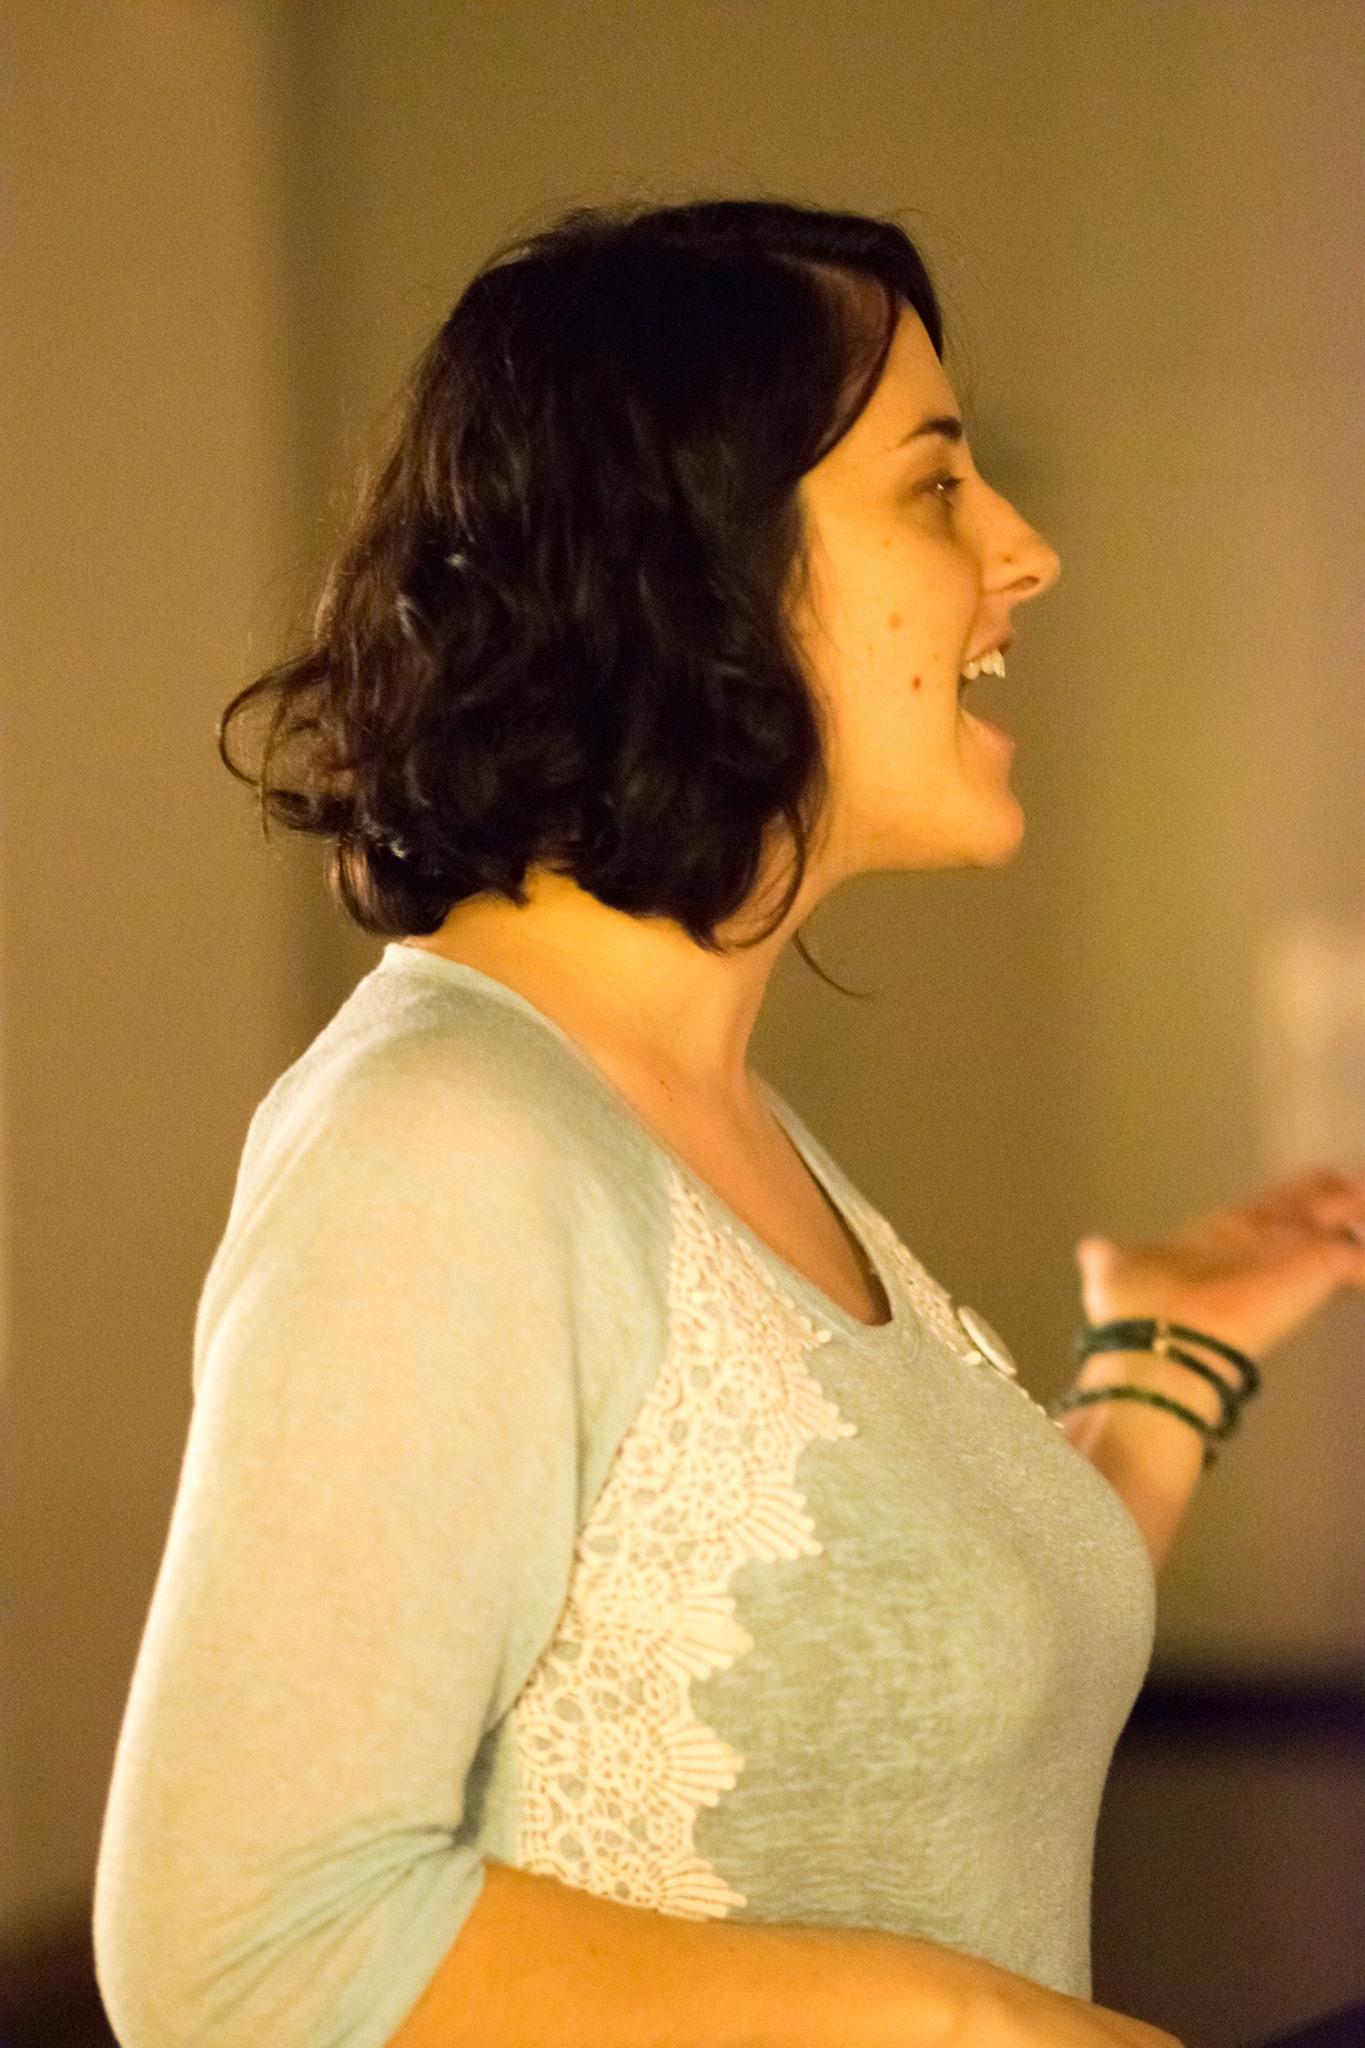 Elisa Johnston Speaking At A Human Trafficking Event